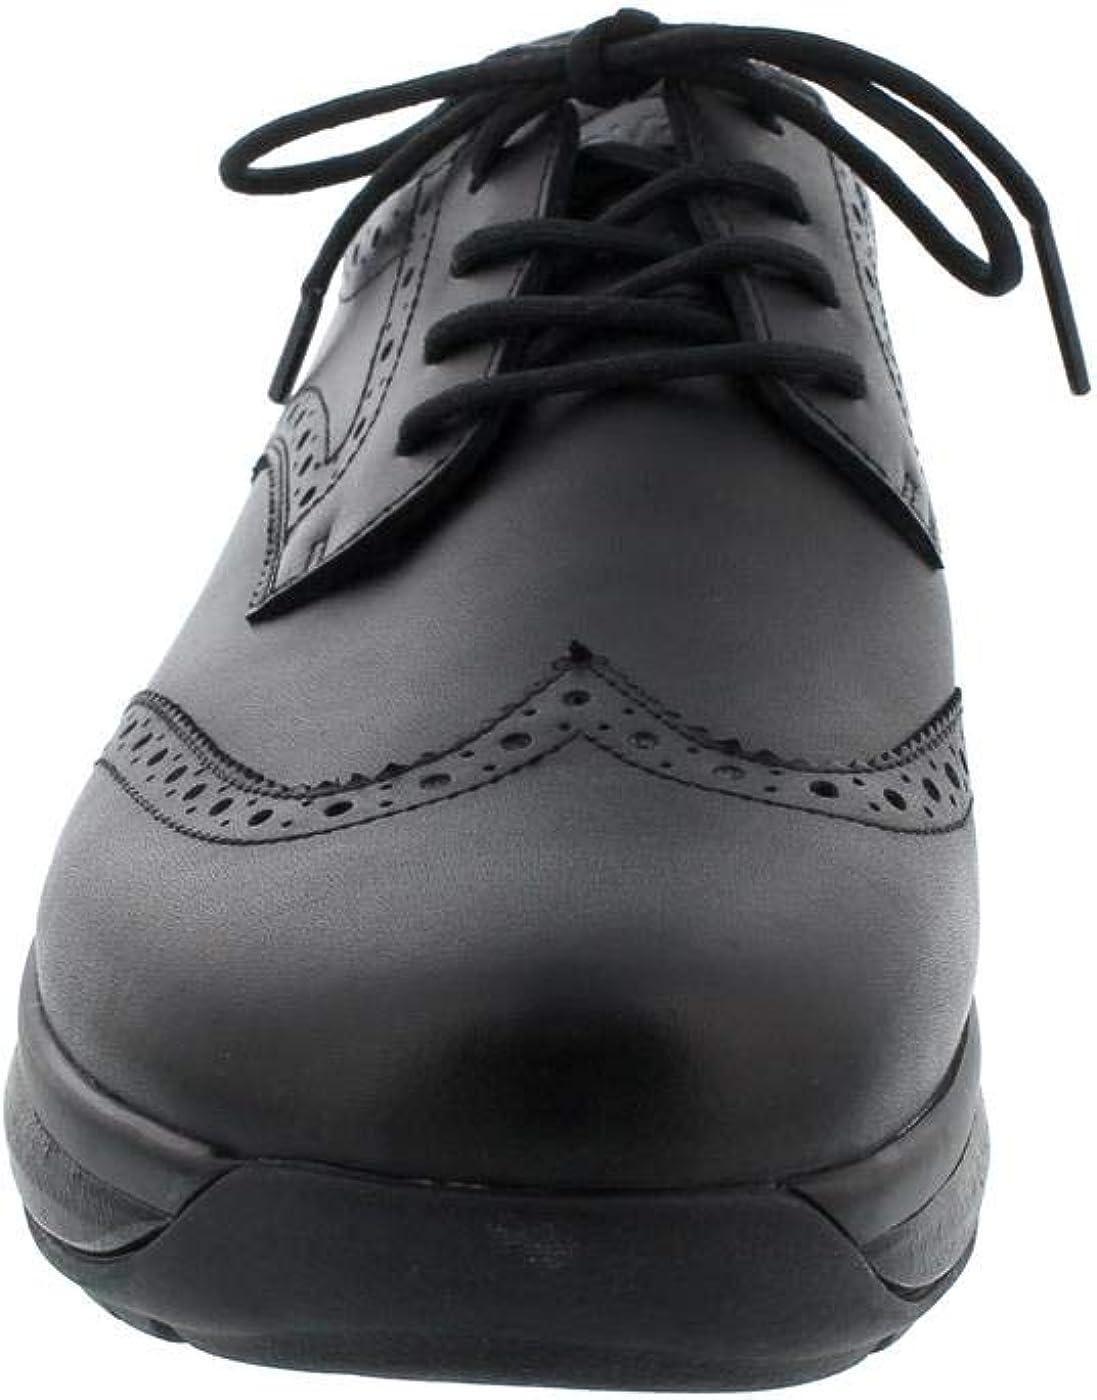 Joya Homme Paso Fino II Cuir Chaussures Noir